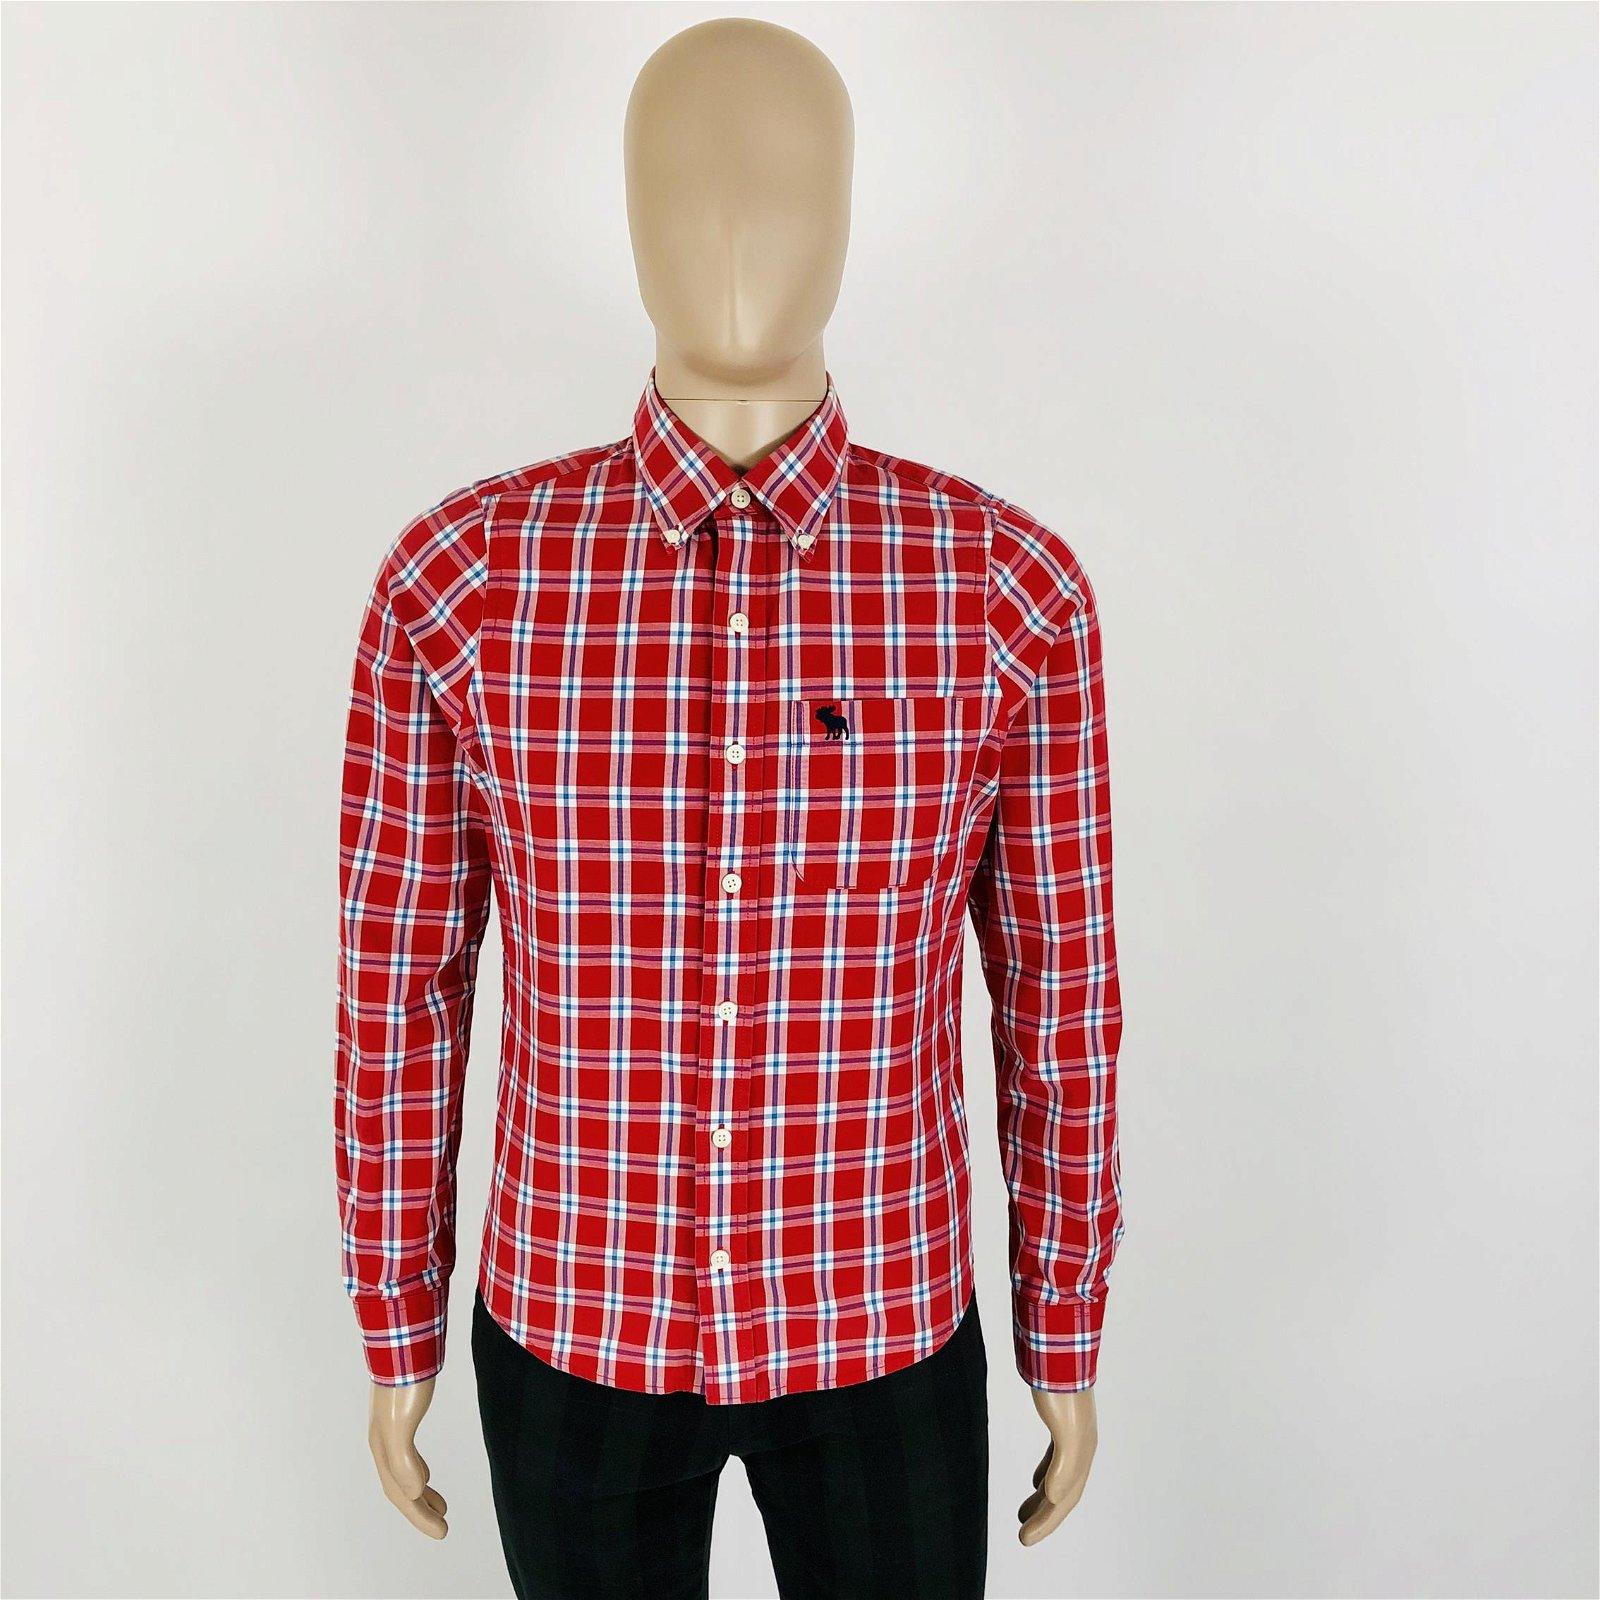 Men's Abercrombie & Fitch Shirt Size S